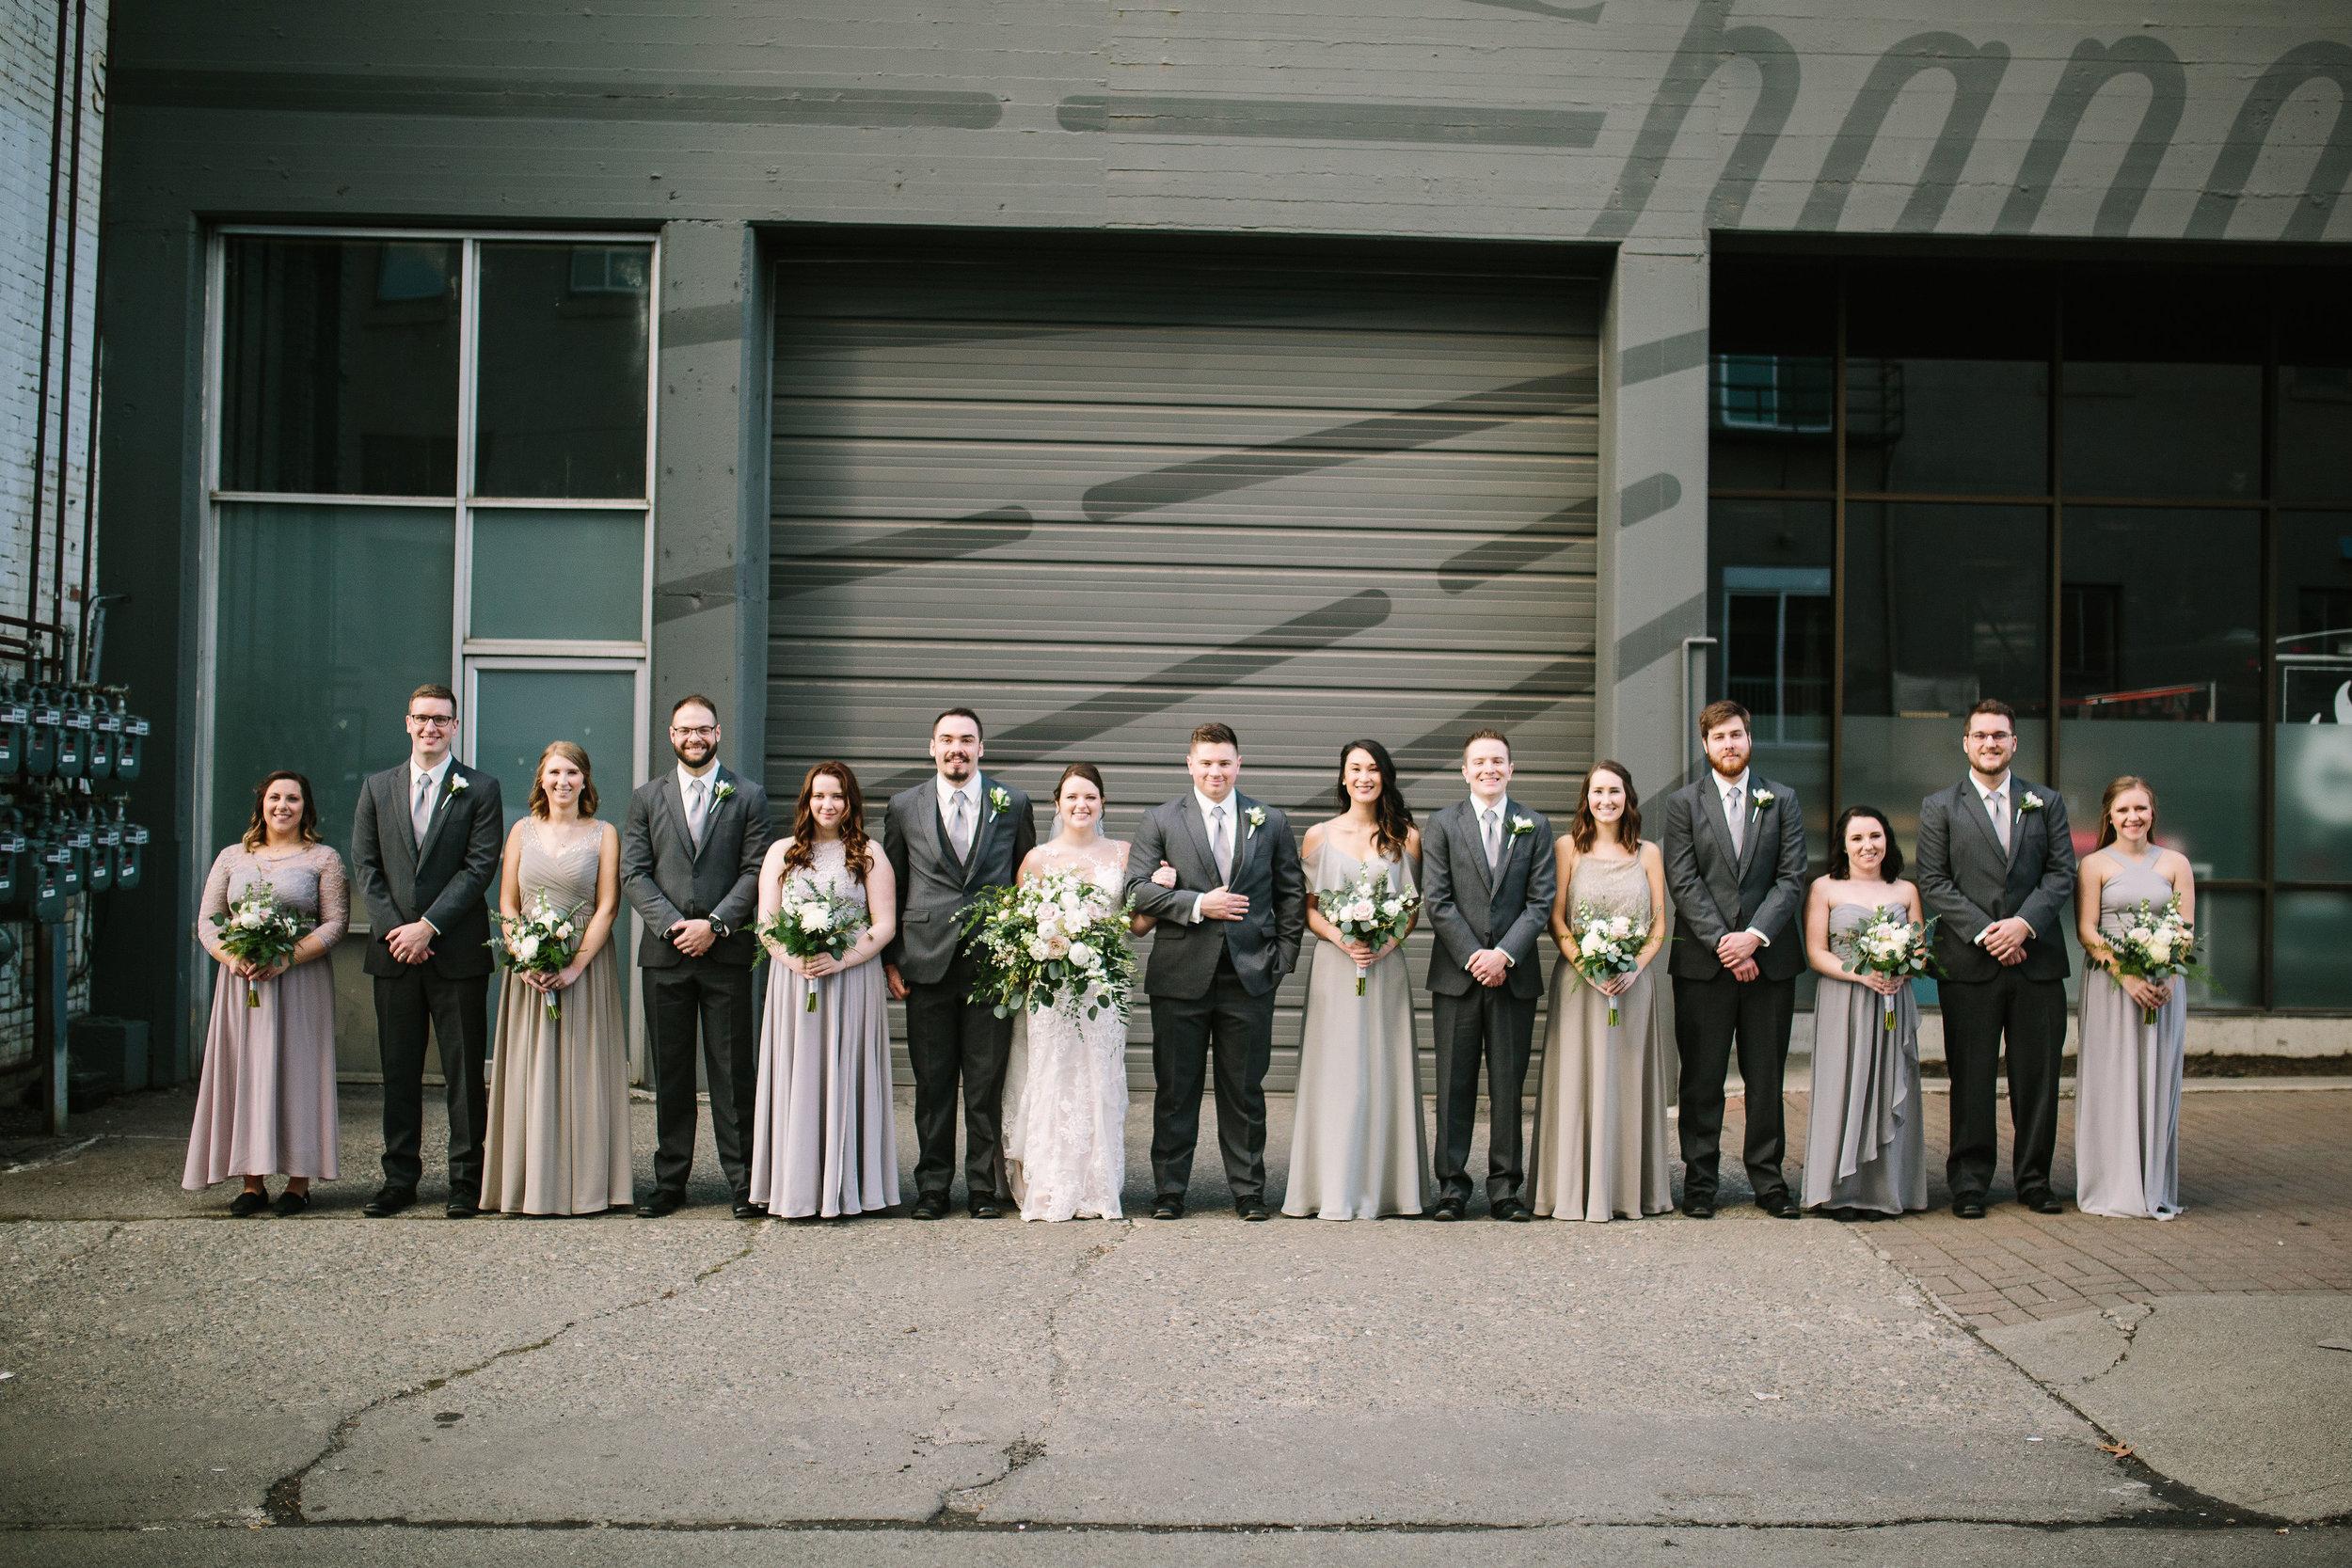 Fun Rustic spokane wedding bridal party standing together before wedding